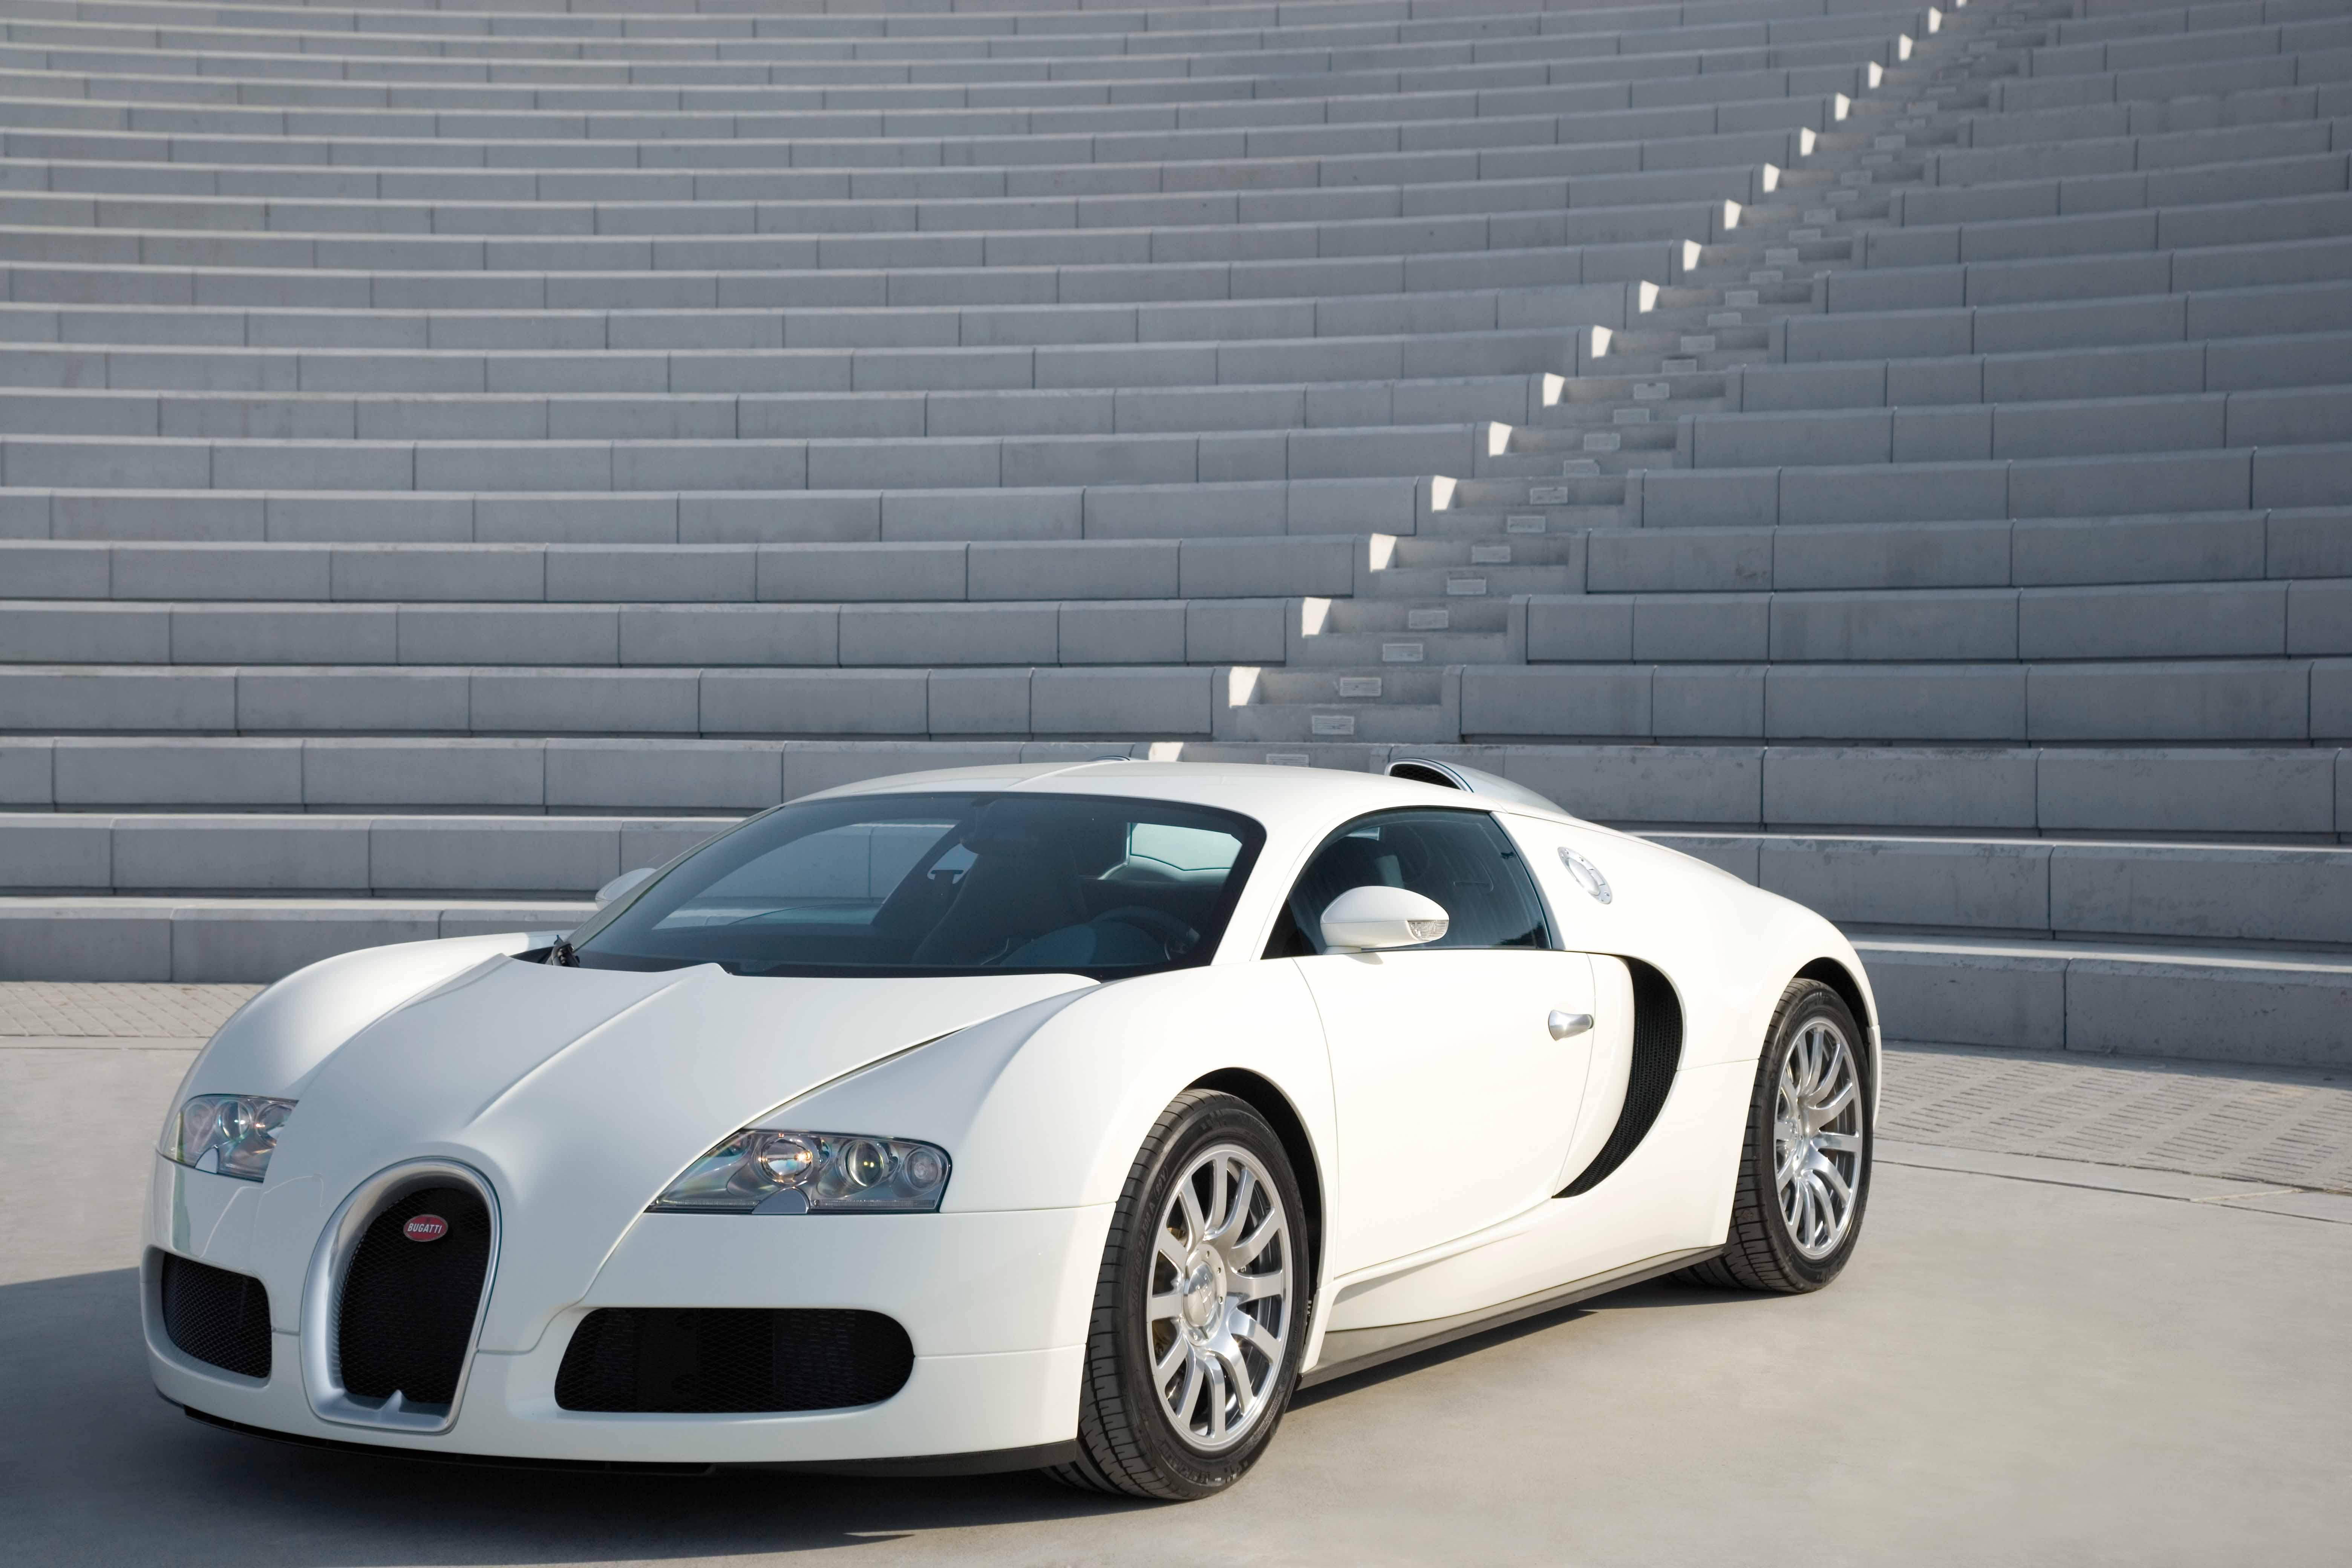 bugatti veyron white wallpaper 111527. Black Bedroom Furniture Sets. Home Design Ideas